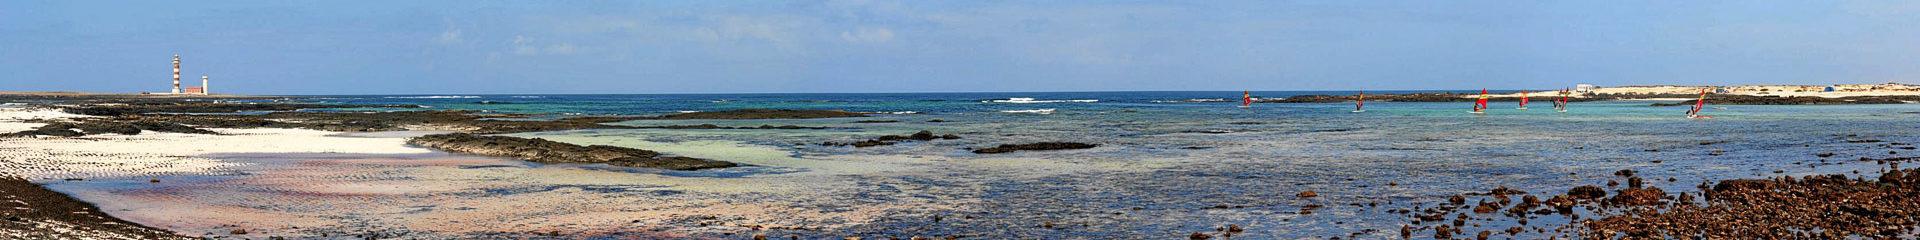 Fuerteventura: Badebucht im Norden